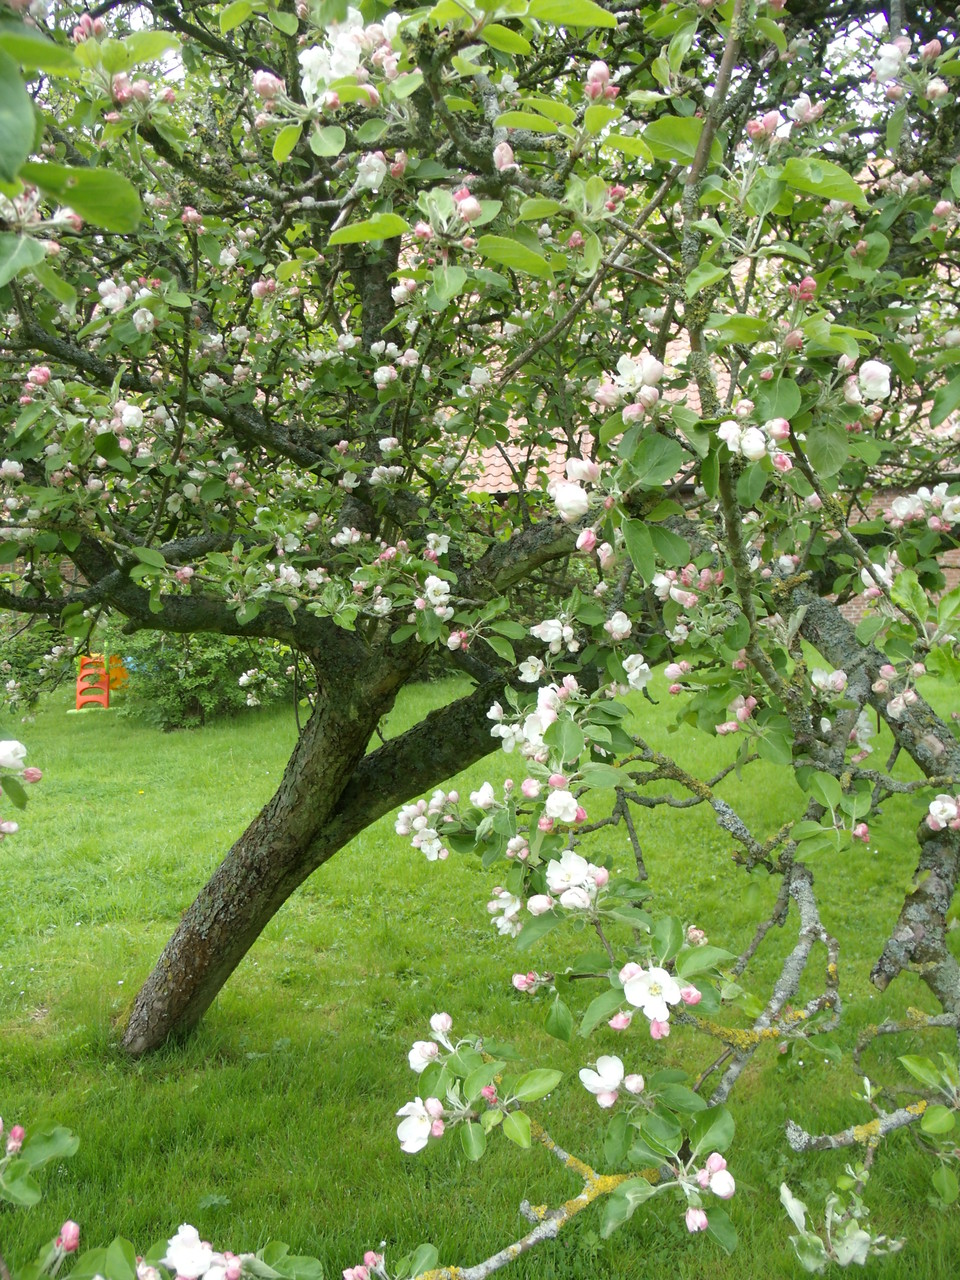 Frühlingsblüte der Apfelbäume